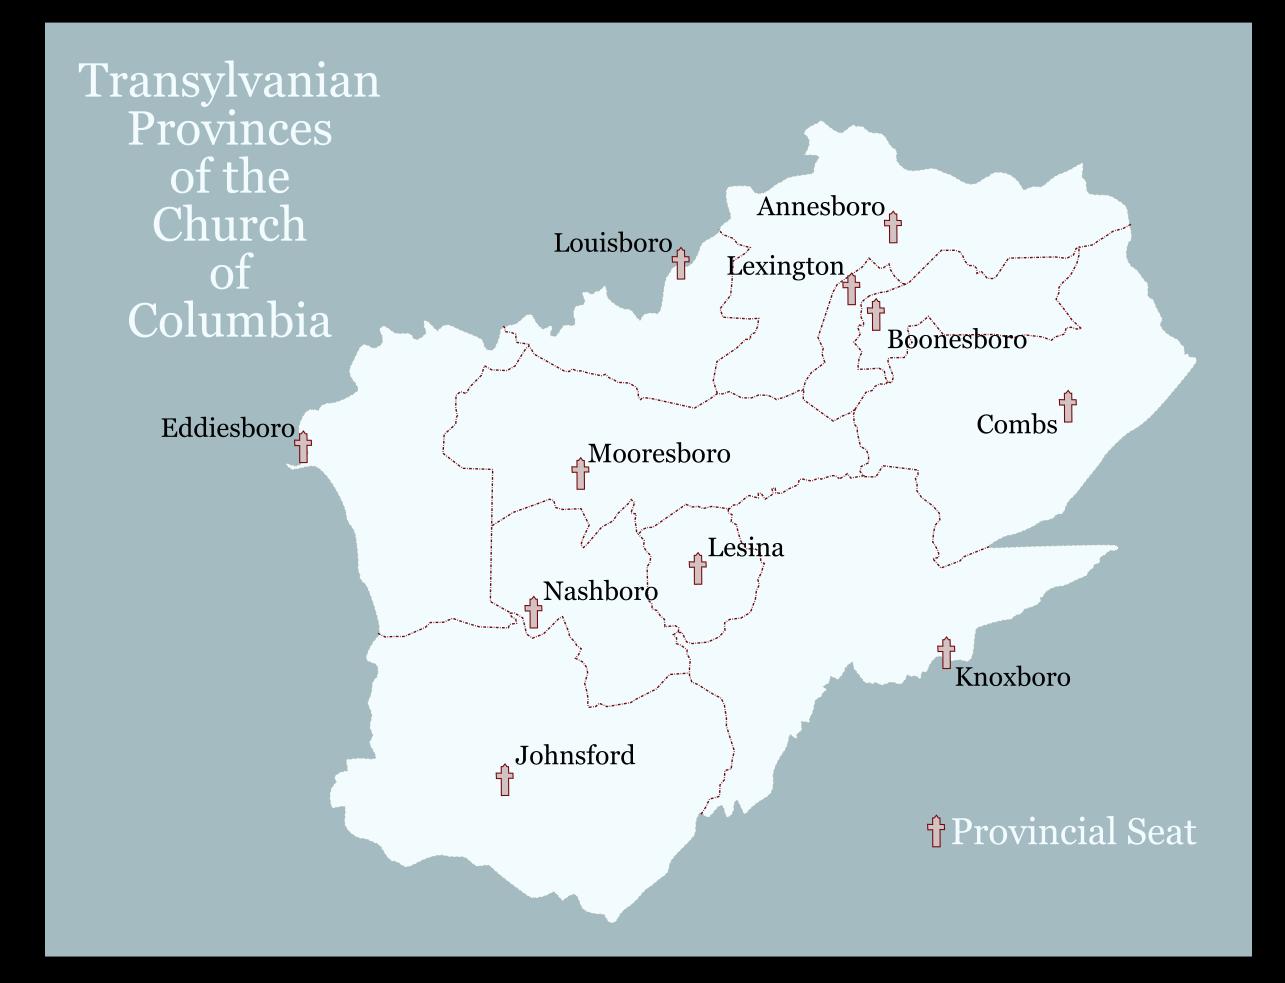 cocprovincestransylvania.png